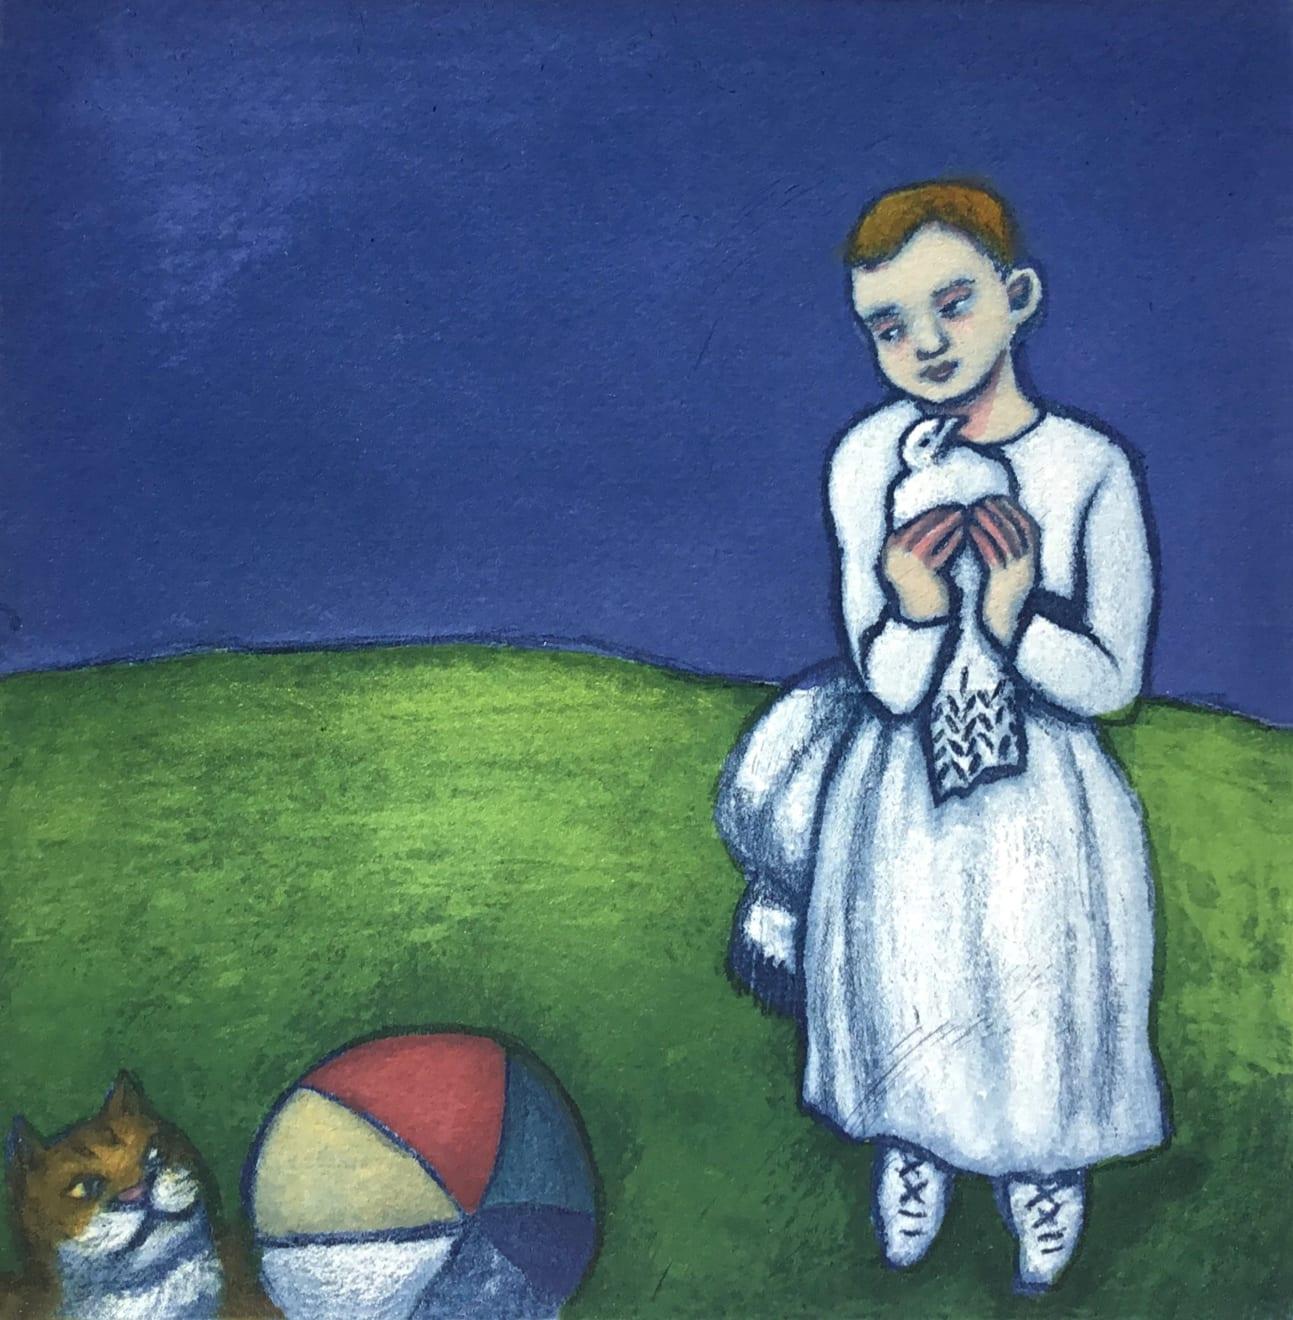 Mychael Barratt, Picasso's Cat, 2018